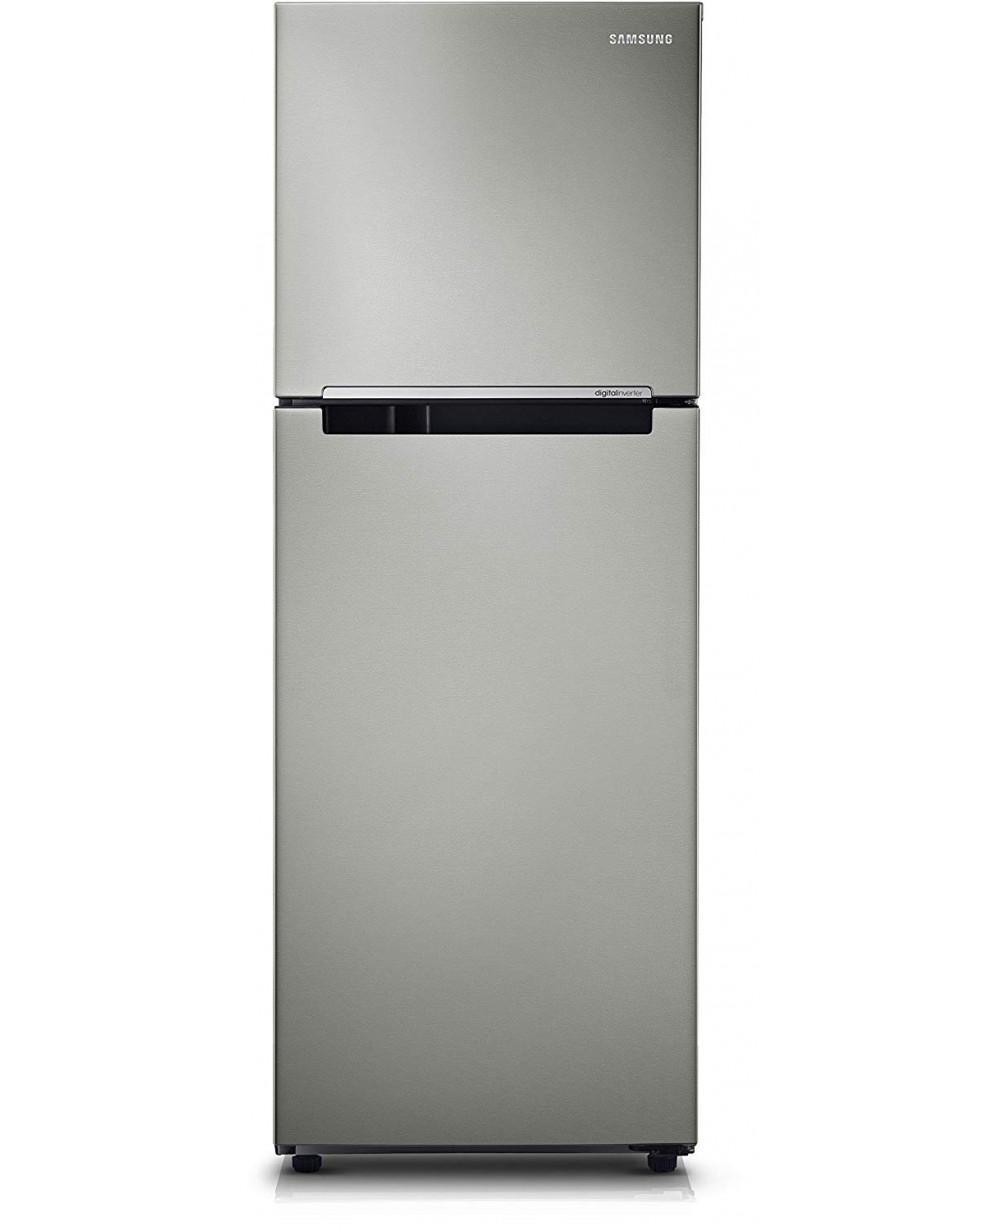 Samsung RT28K3052S8 Refrigerator